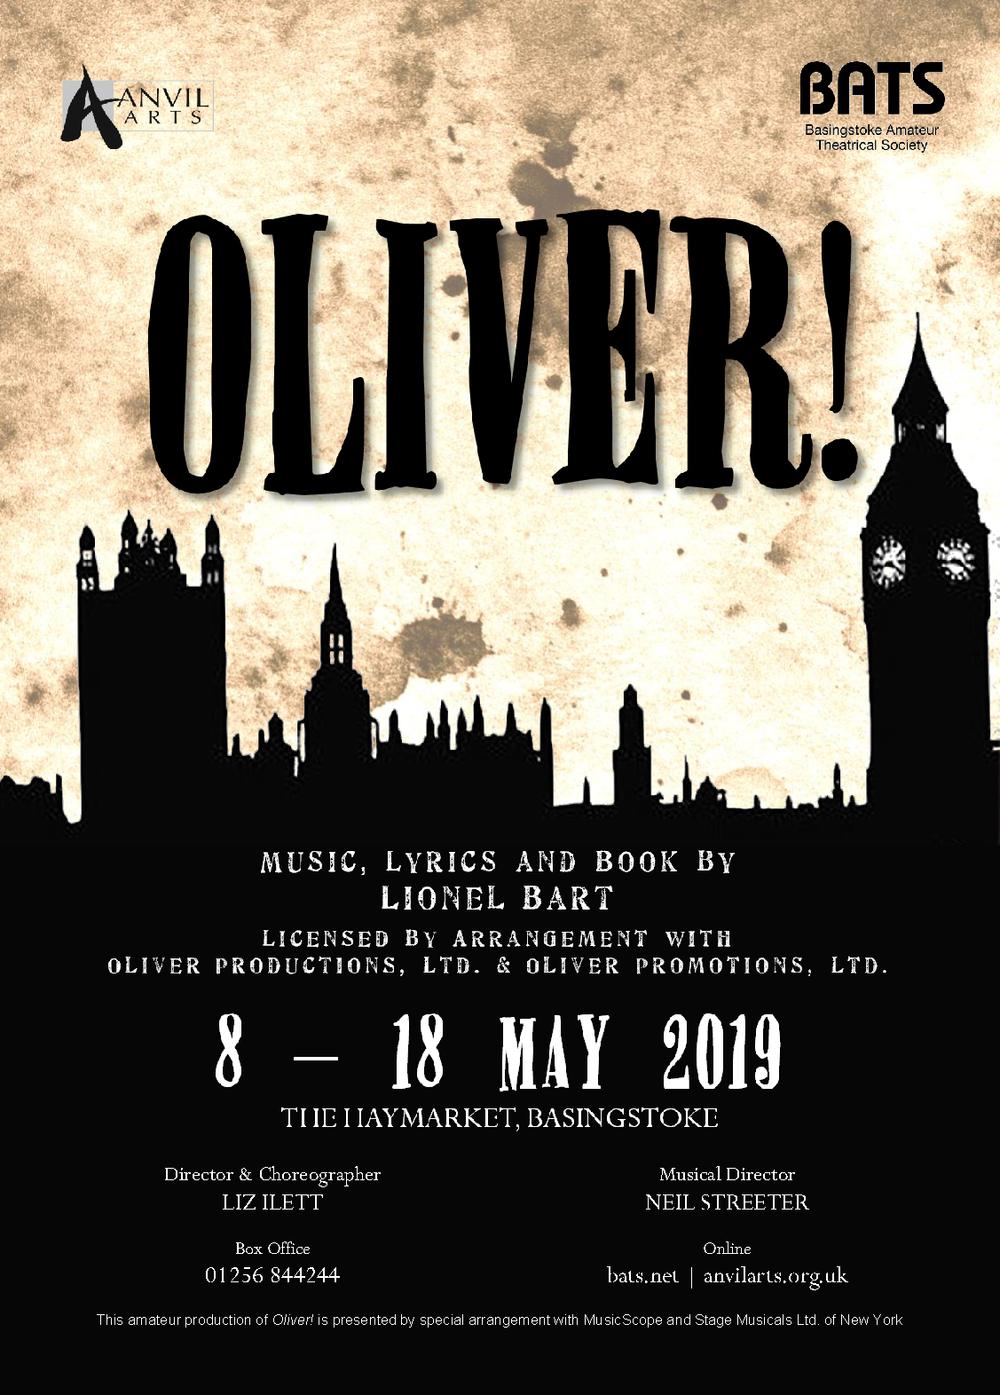 bats-oliver-poster-may-2019